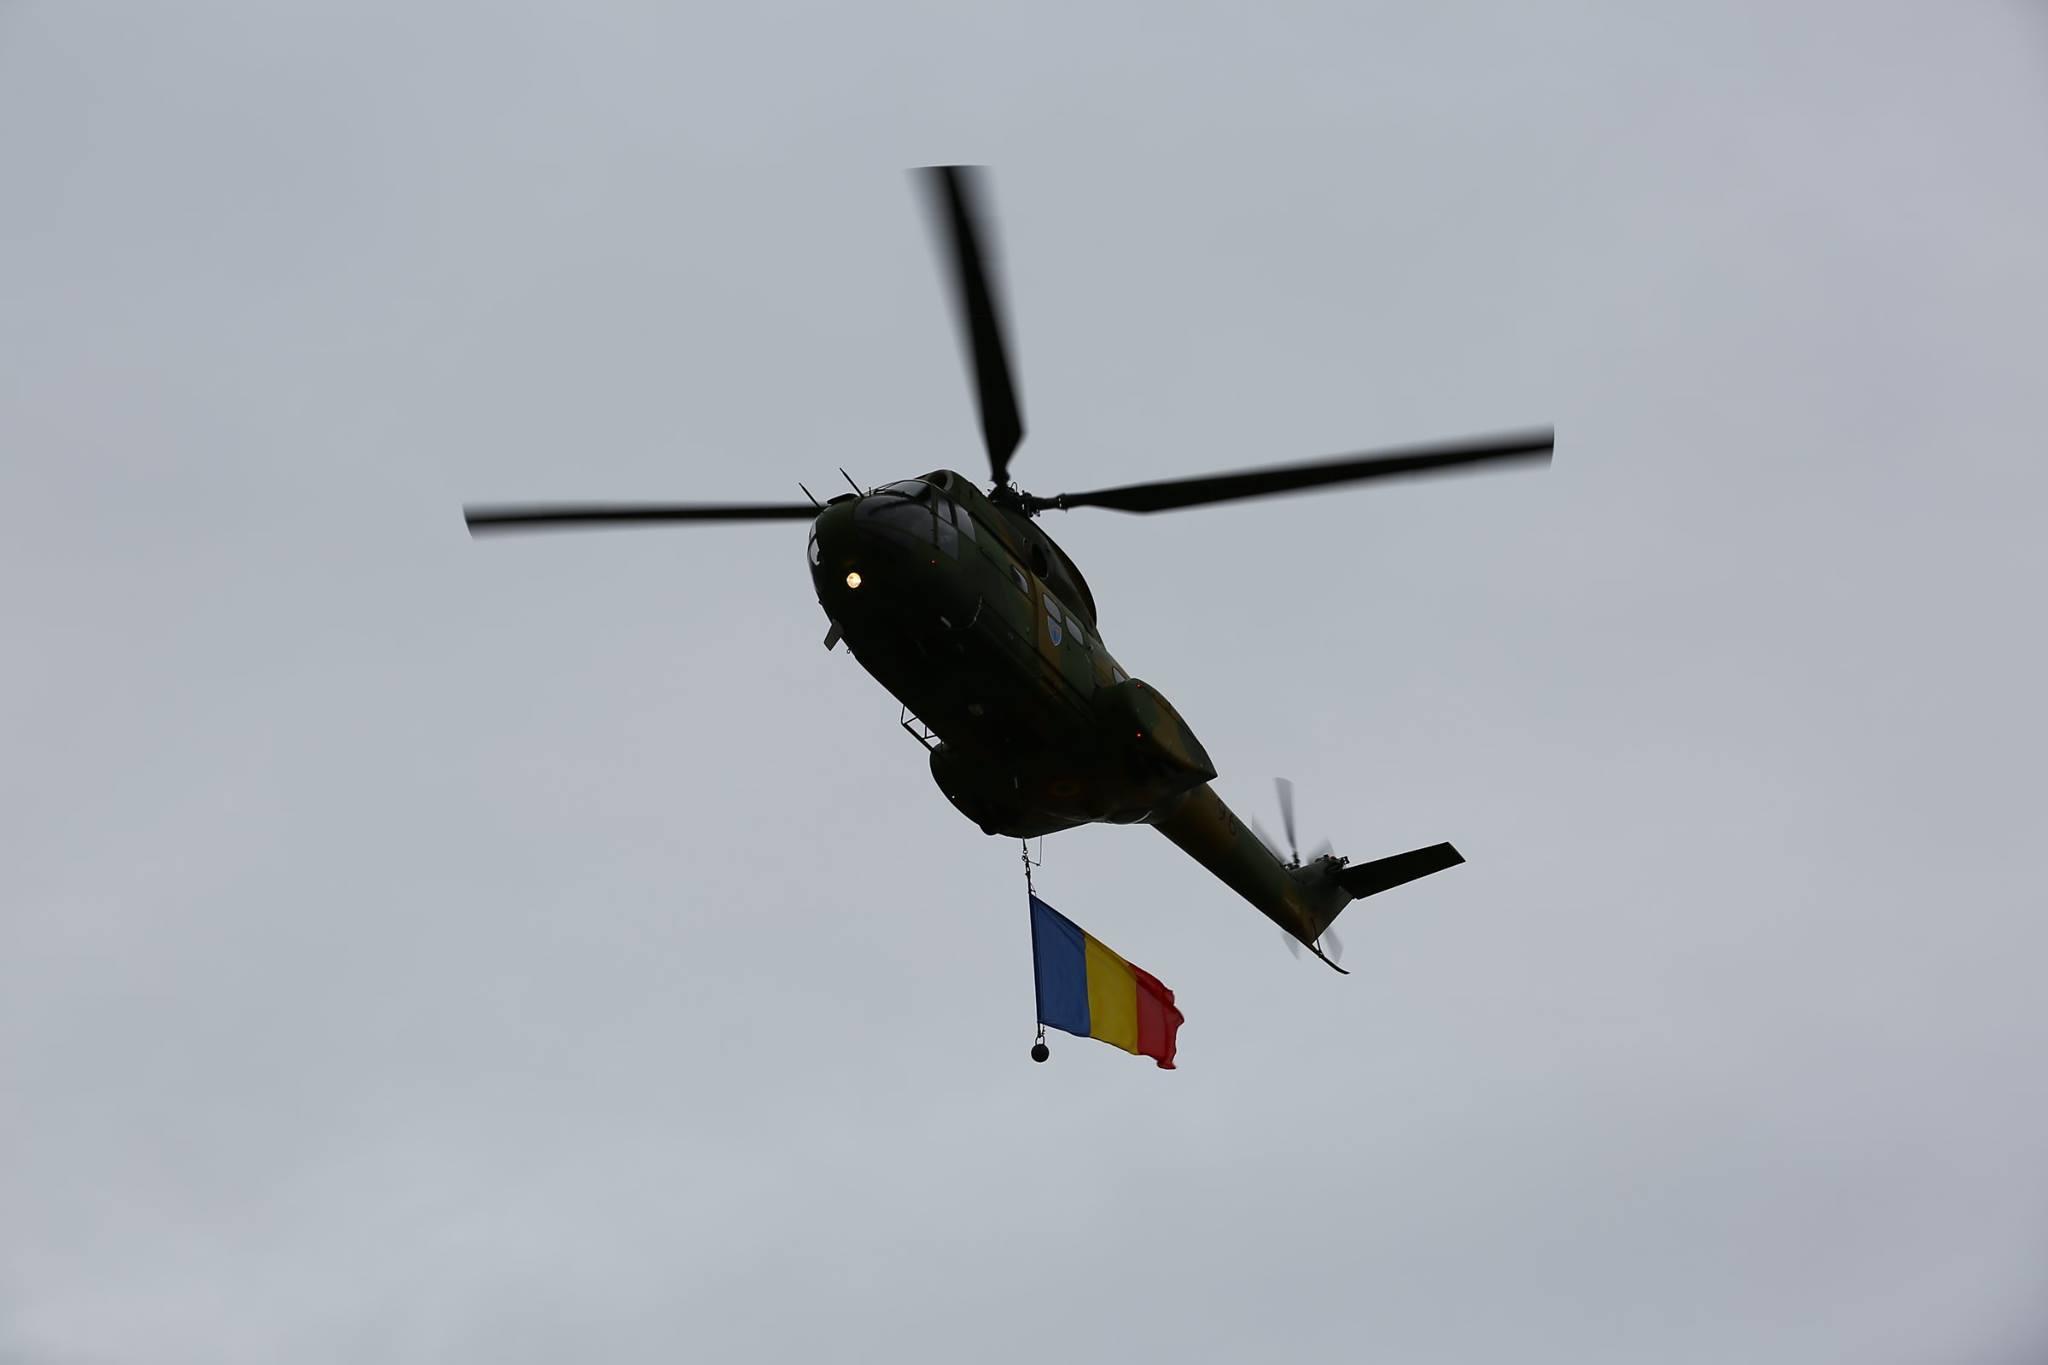 Repetitii parada militara 1 decembrie. Foto - MApN 11